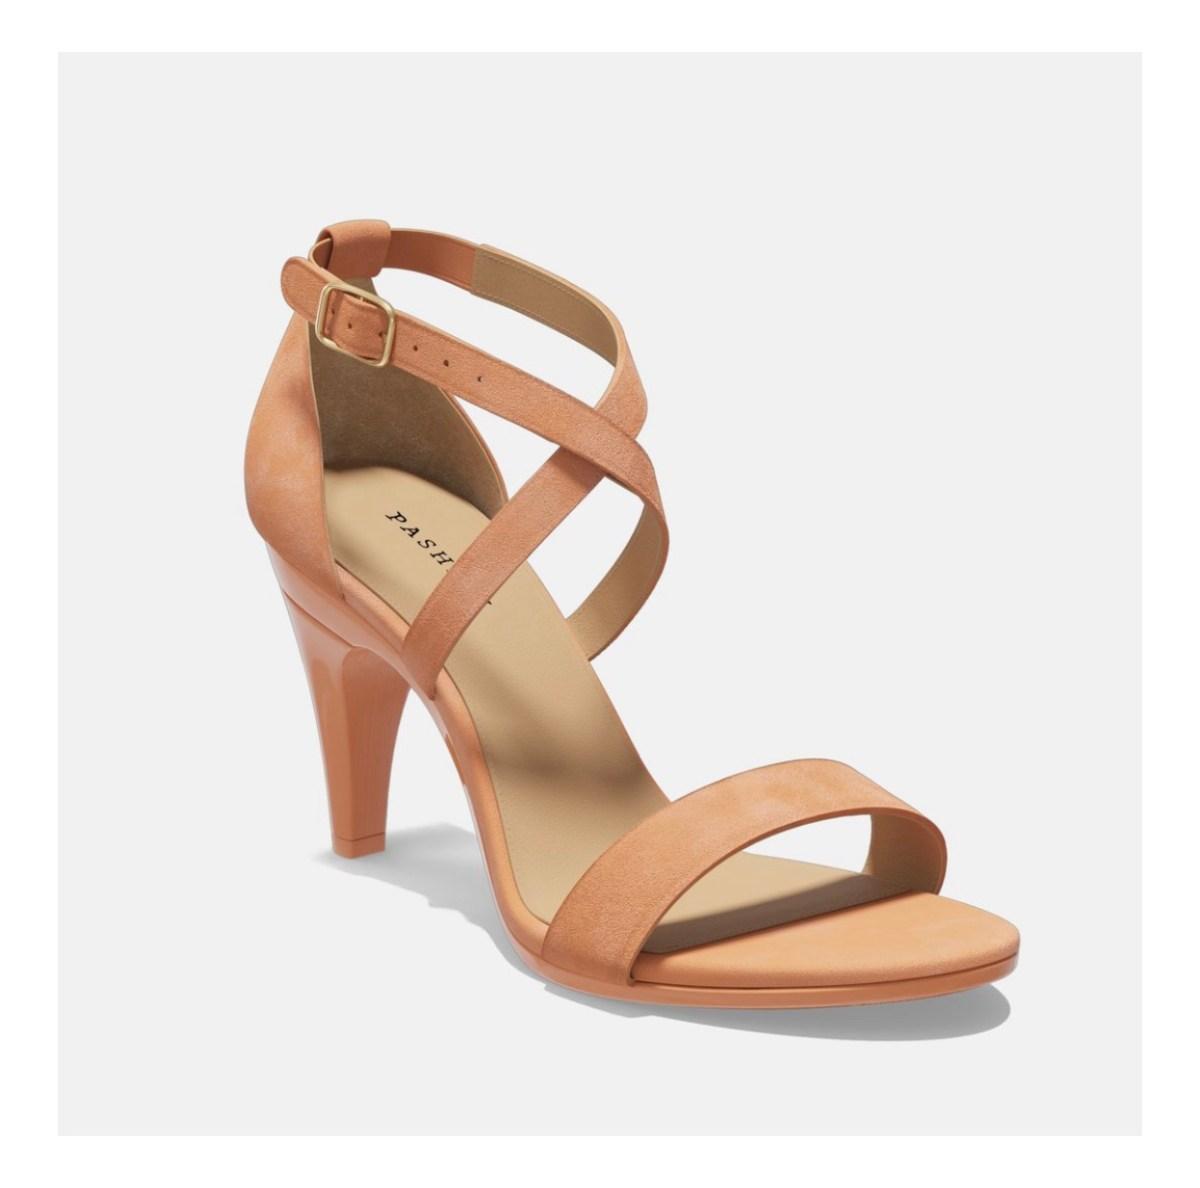 Pashion Footwear Sandal heel